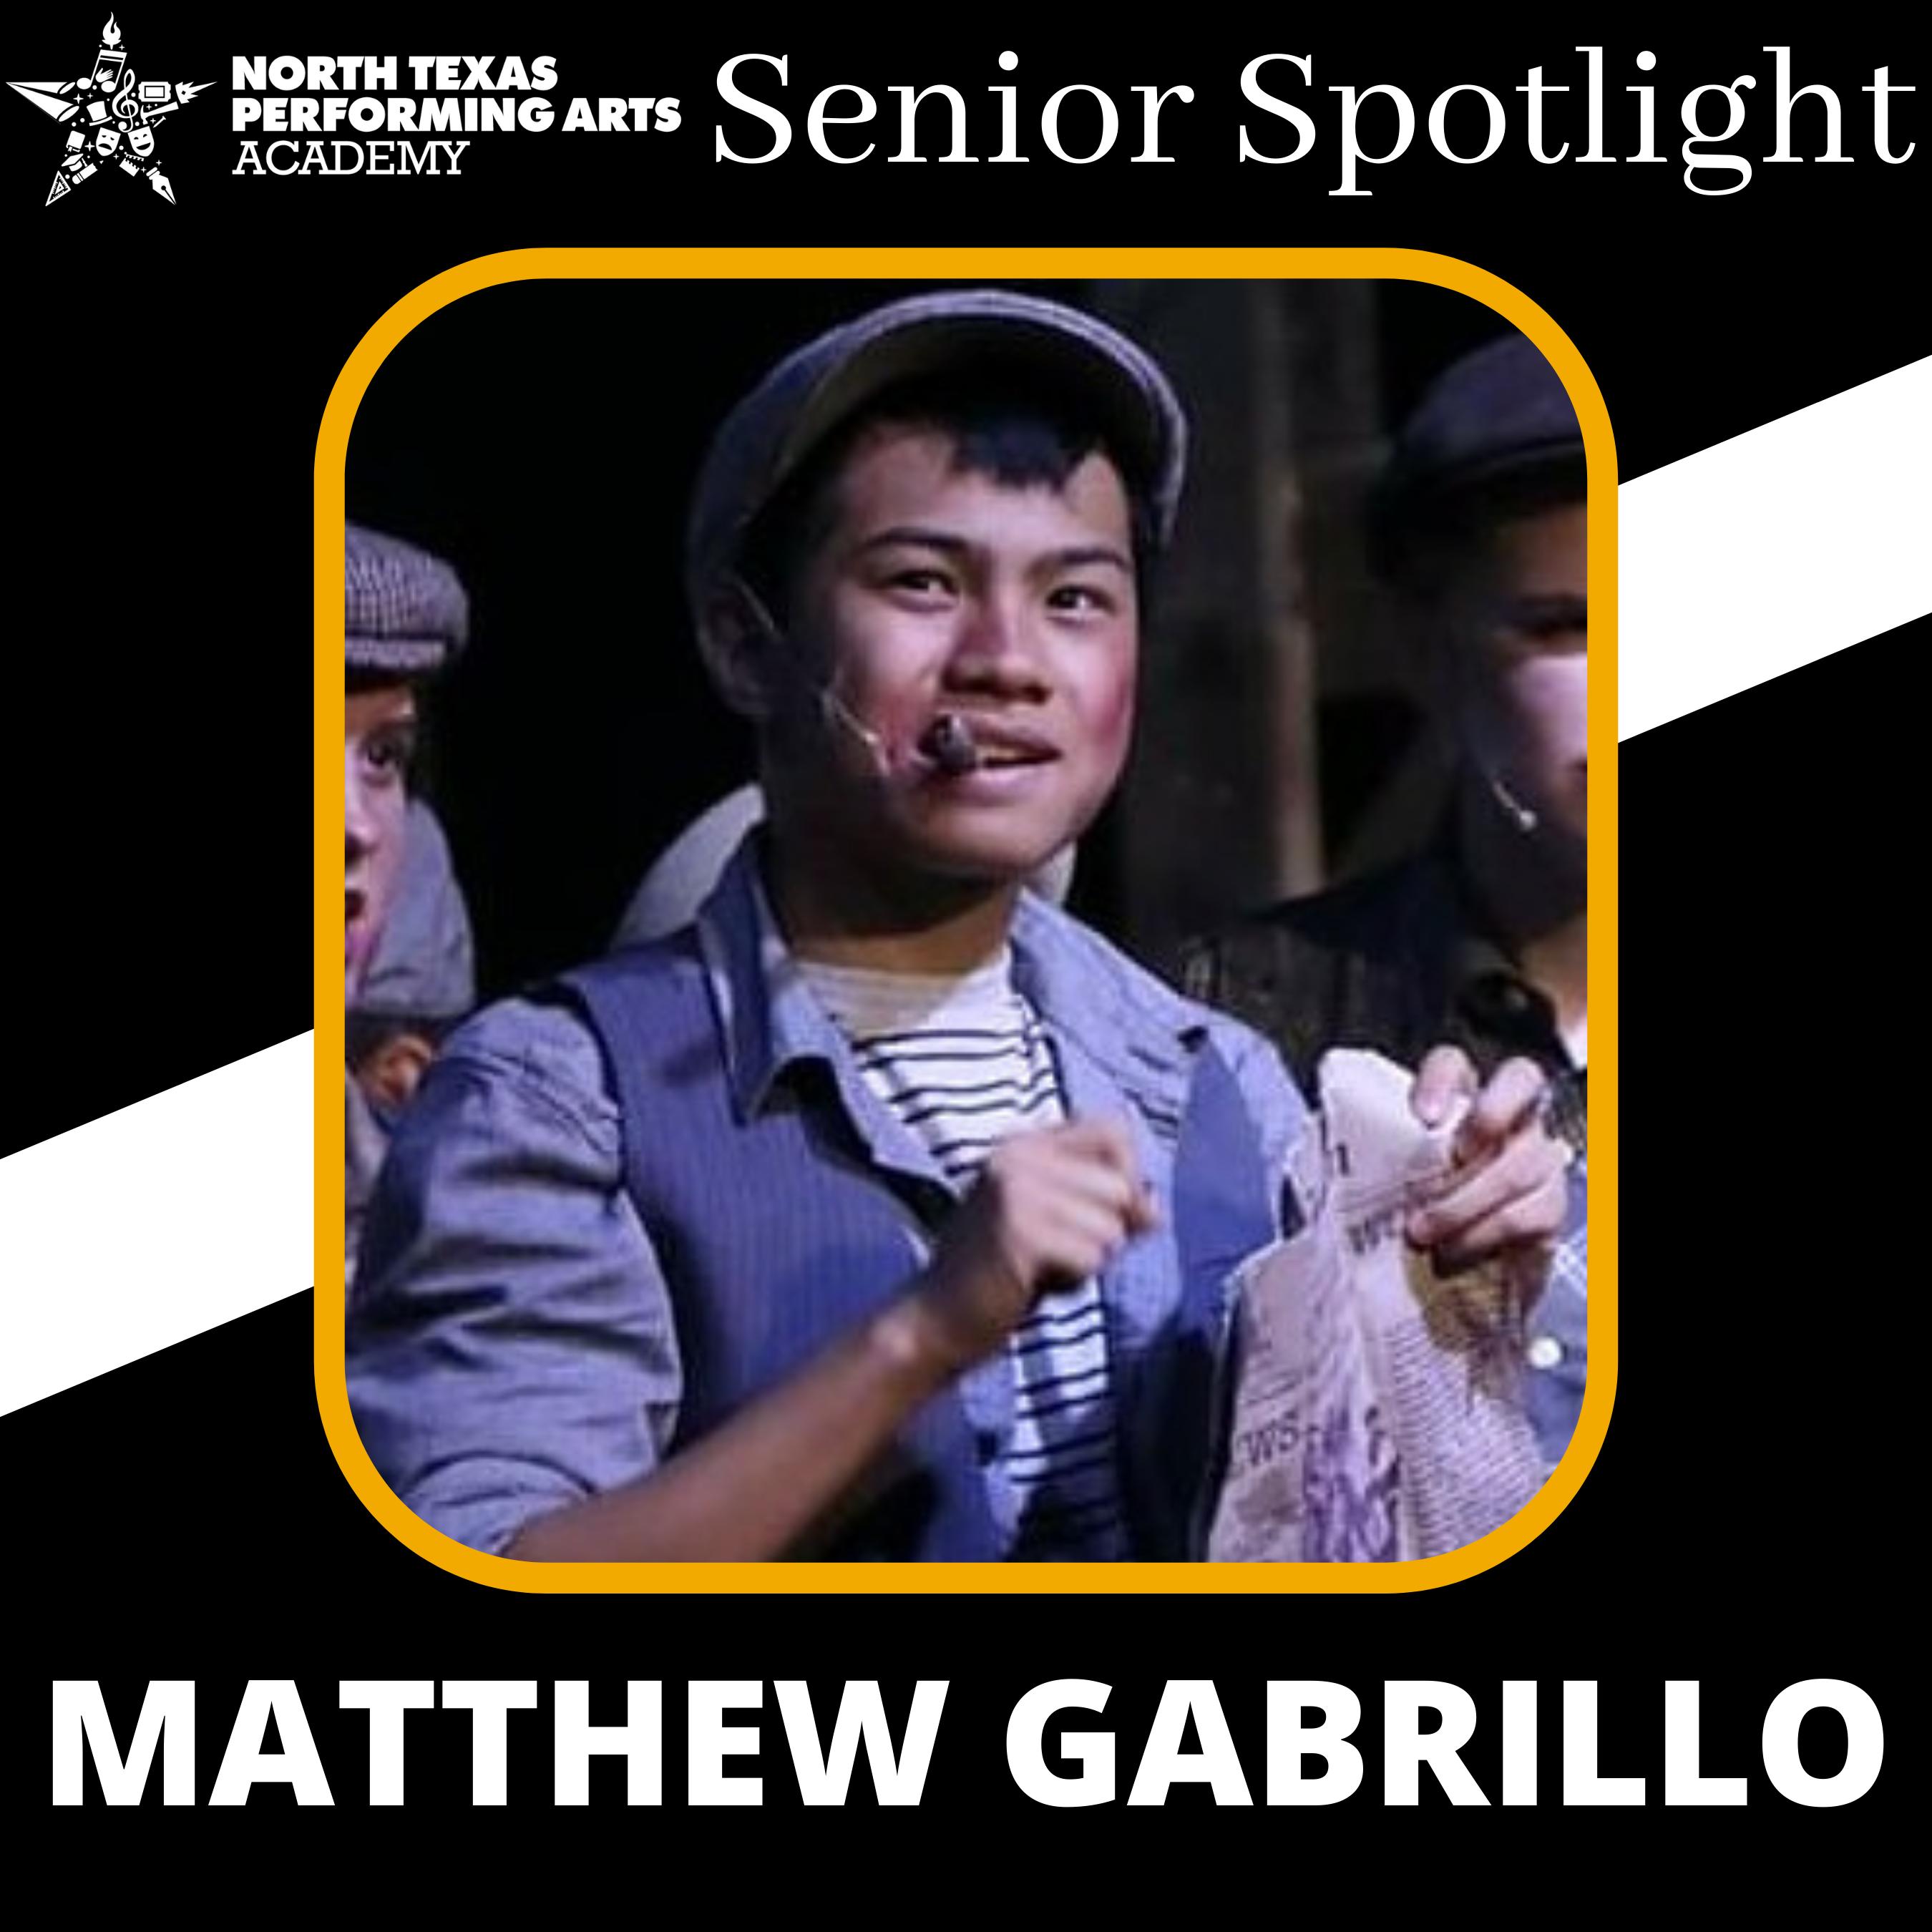 Matthew Gabrillo headshot